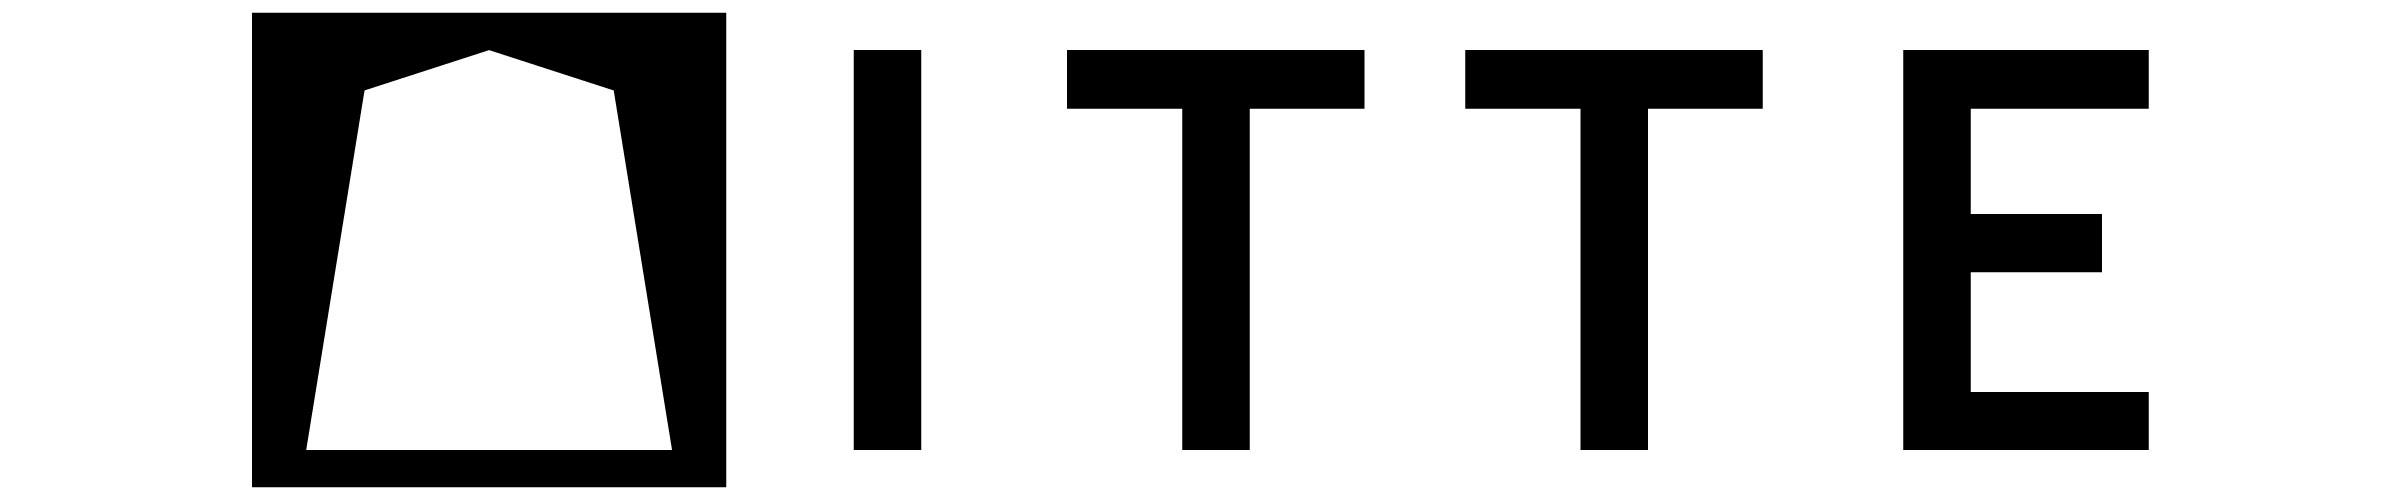 ITTEのロゴ画像